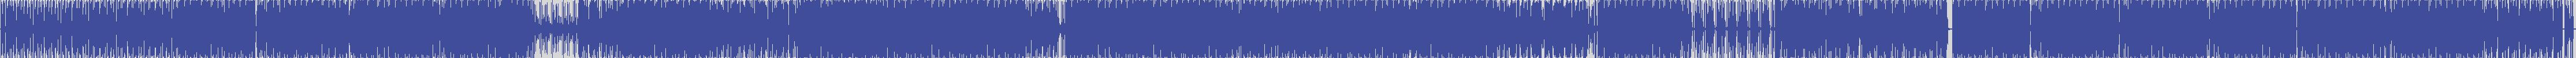 delectable [DEL070] Daniele Stella - Trumpet Love [Original Mix] audio wave form